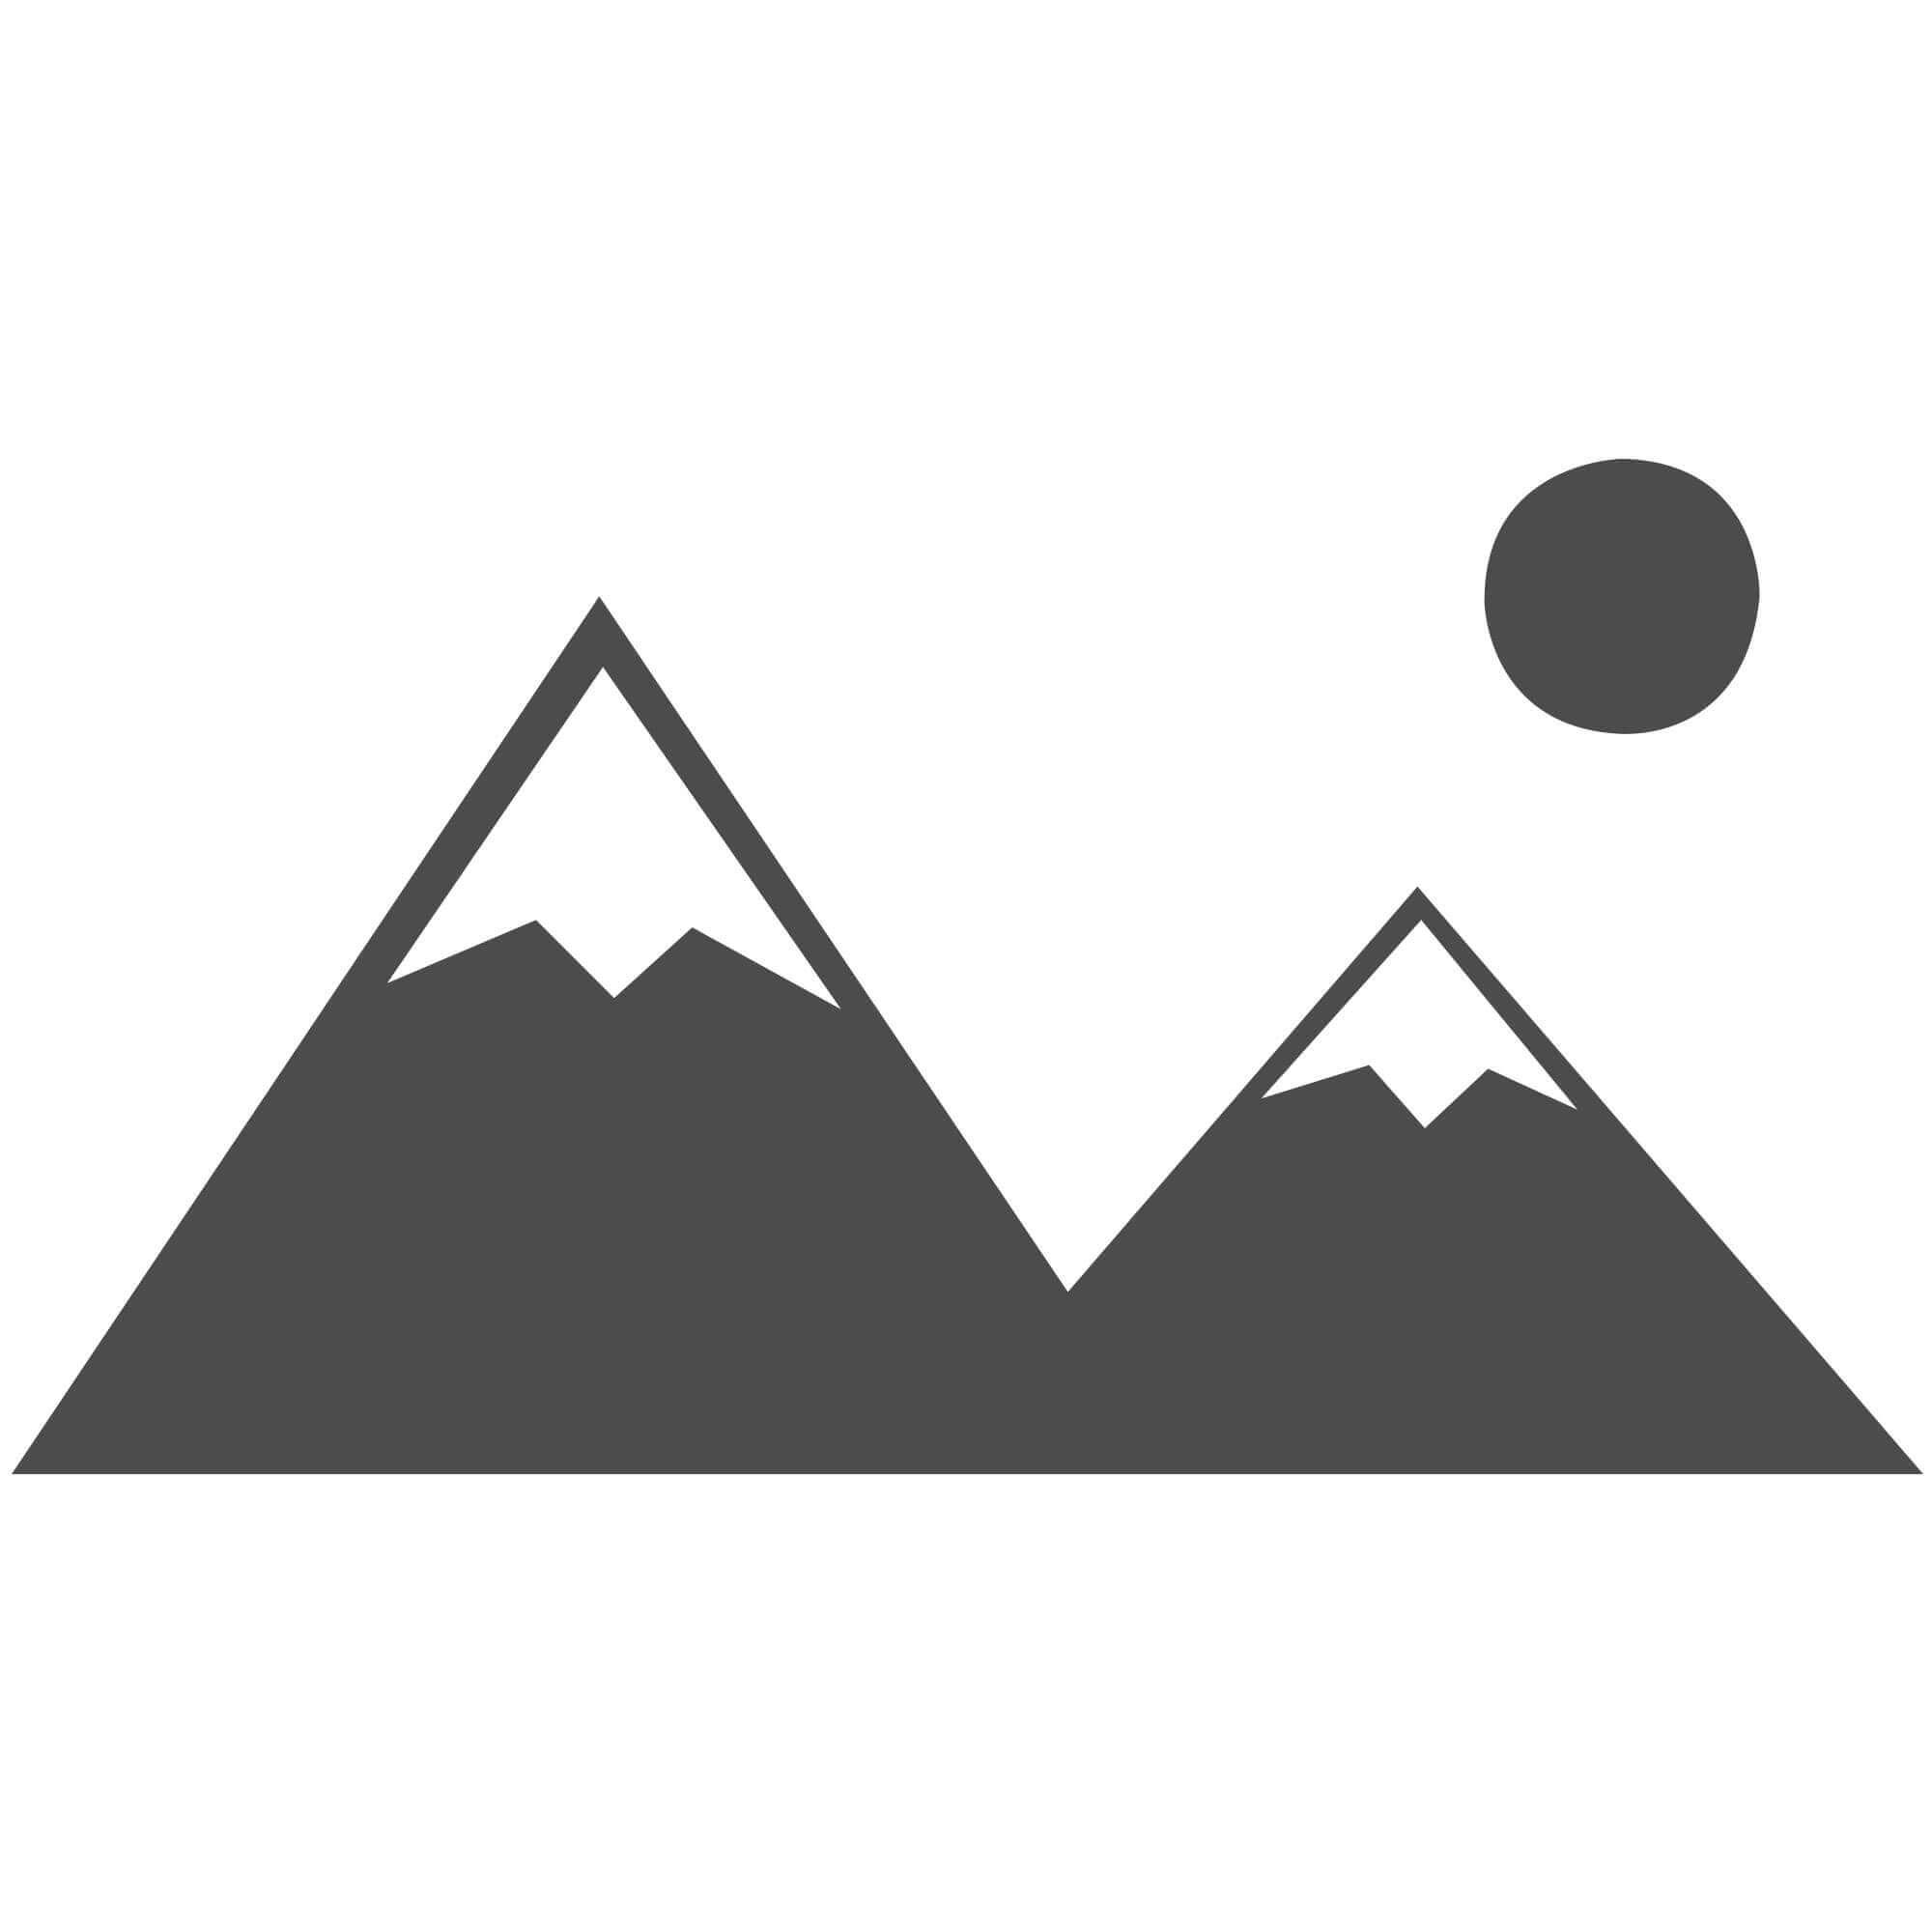 "Persian Shiraz Hand knotted Tribal Wool Rug - 100 x 147 cm (3'3"" x 4'10"")"